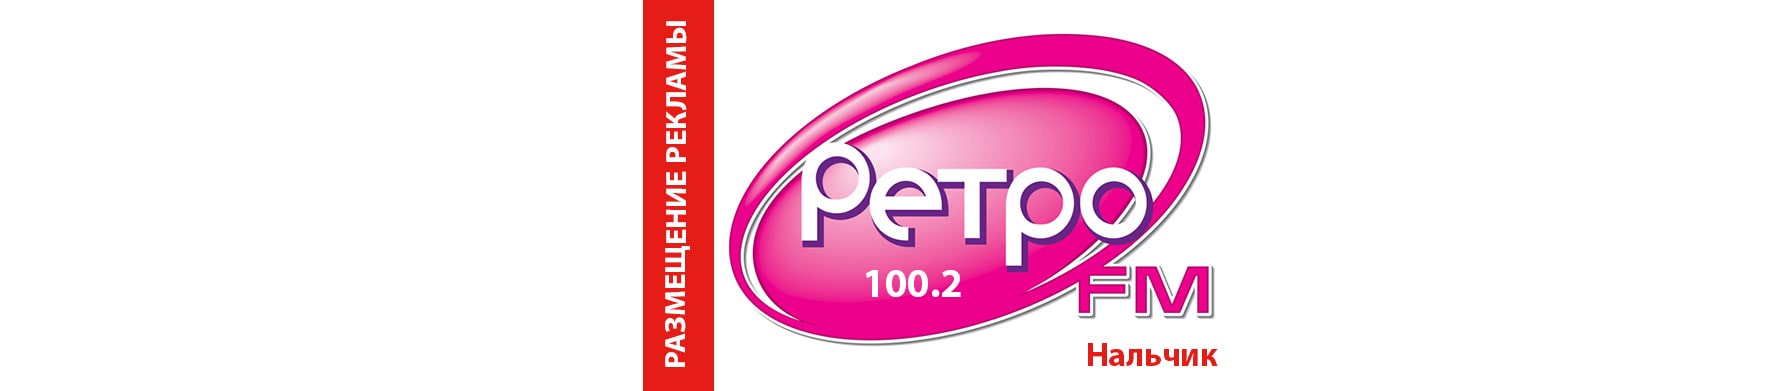 Реклама на радио в Кабардино-Балкарии Ретро FM